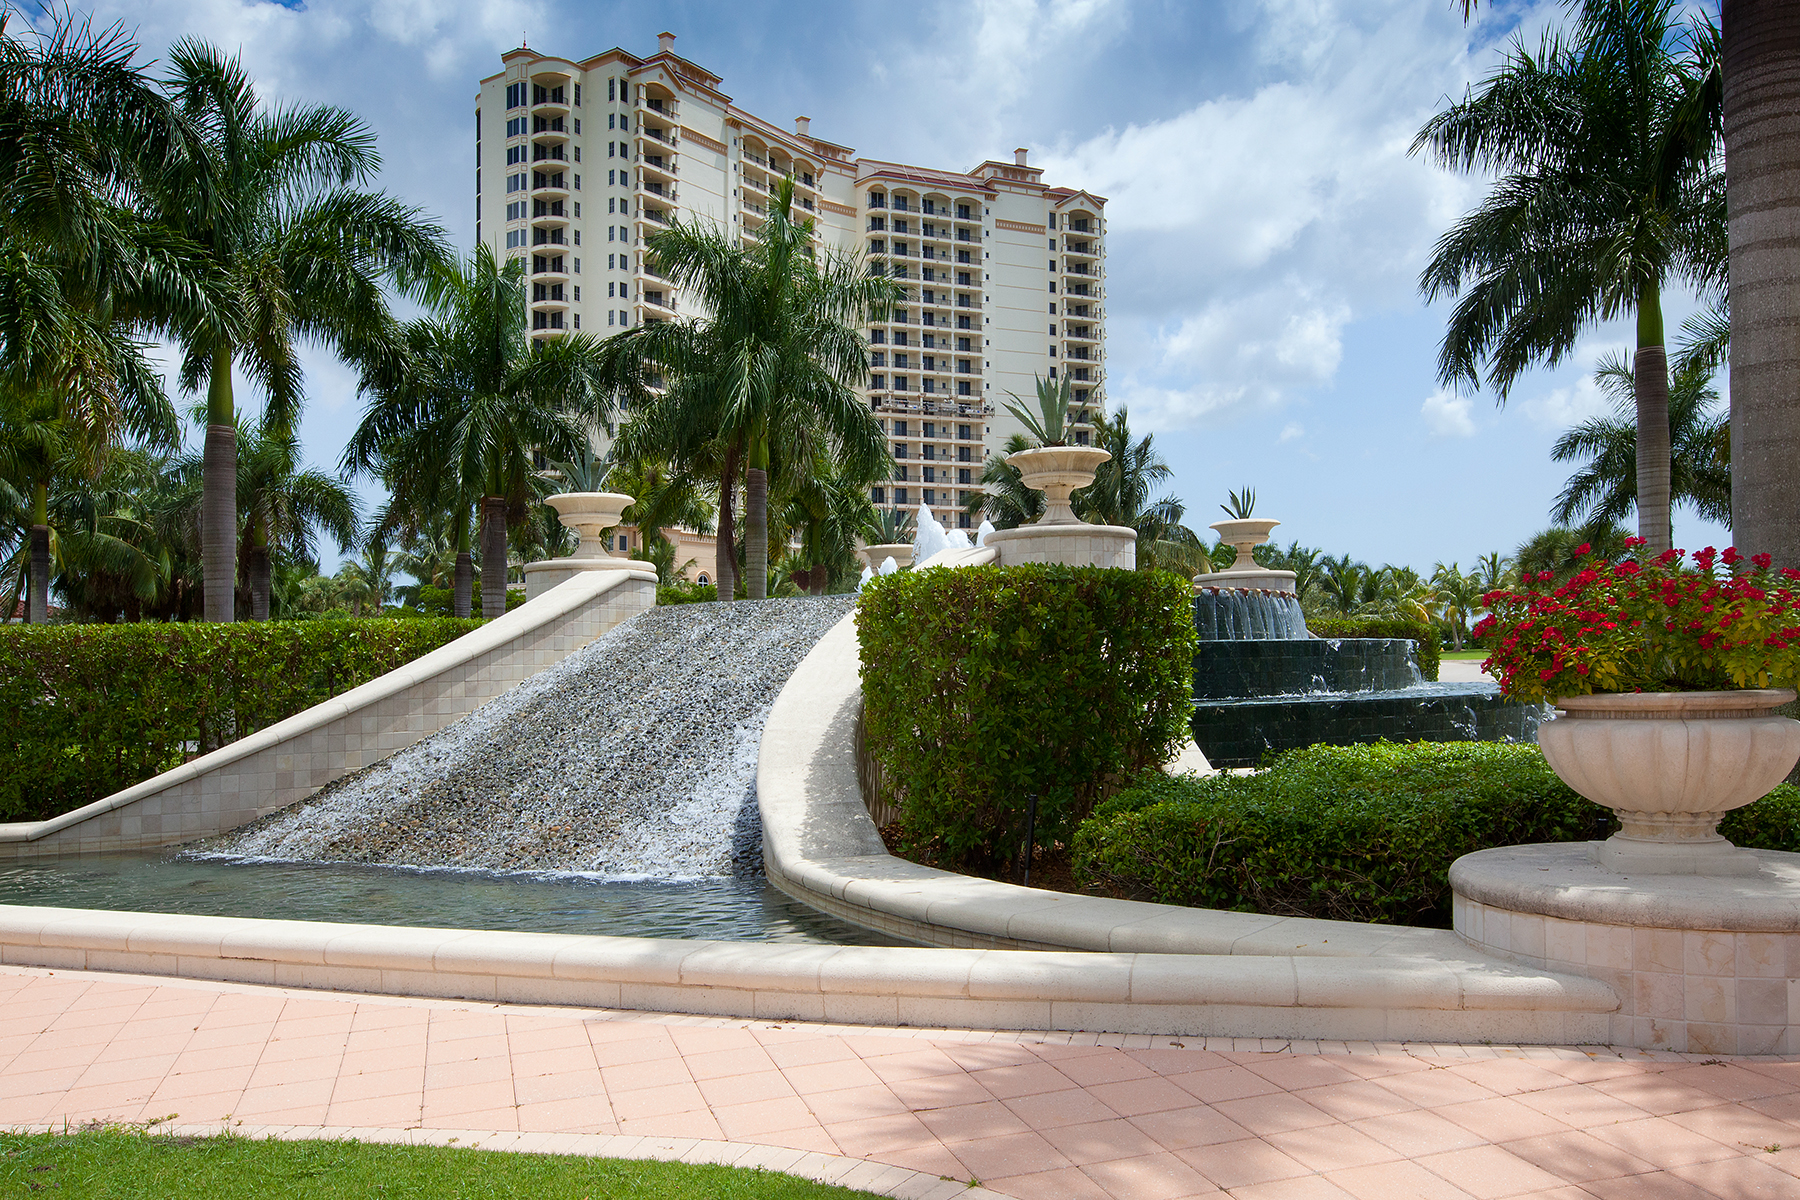 Condominium for Sale at HAMMOCK BAY 1050 Borghese Ln 302, Naples, Florida 34114 United States